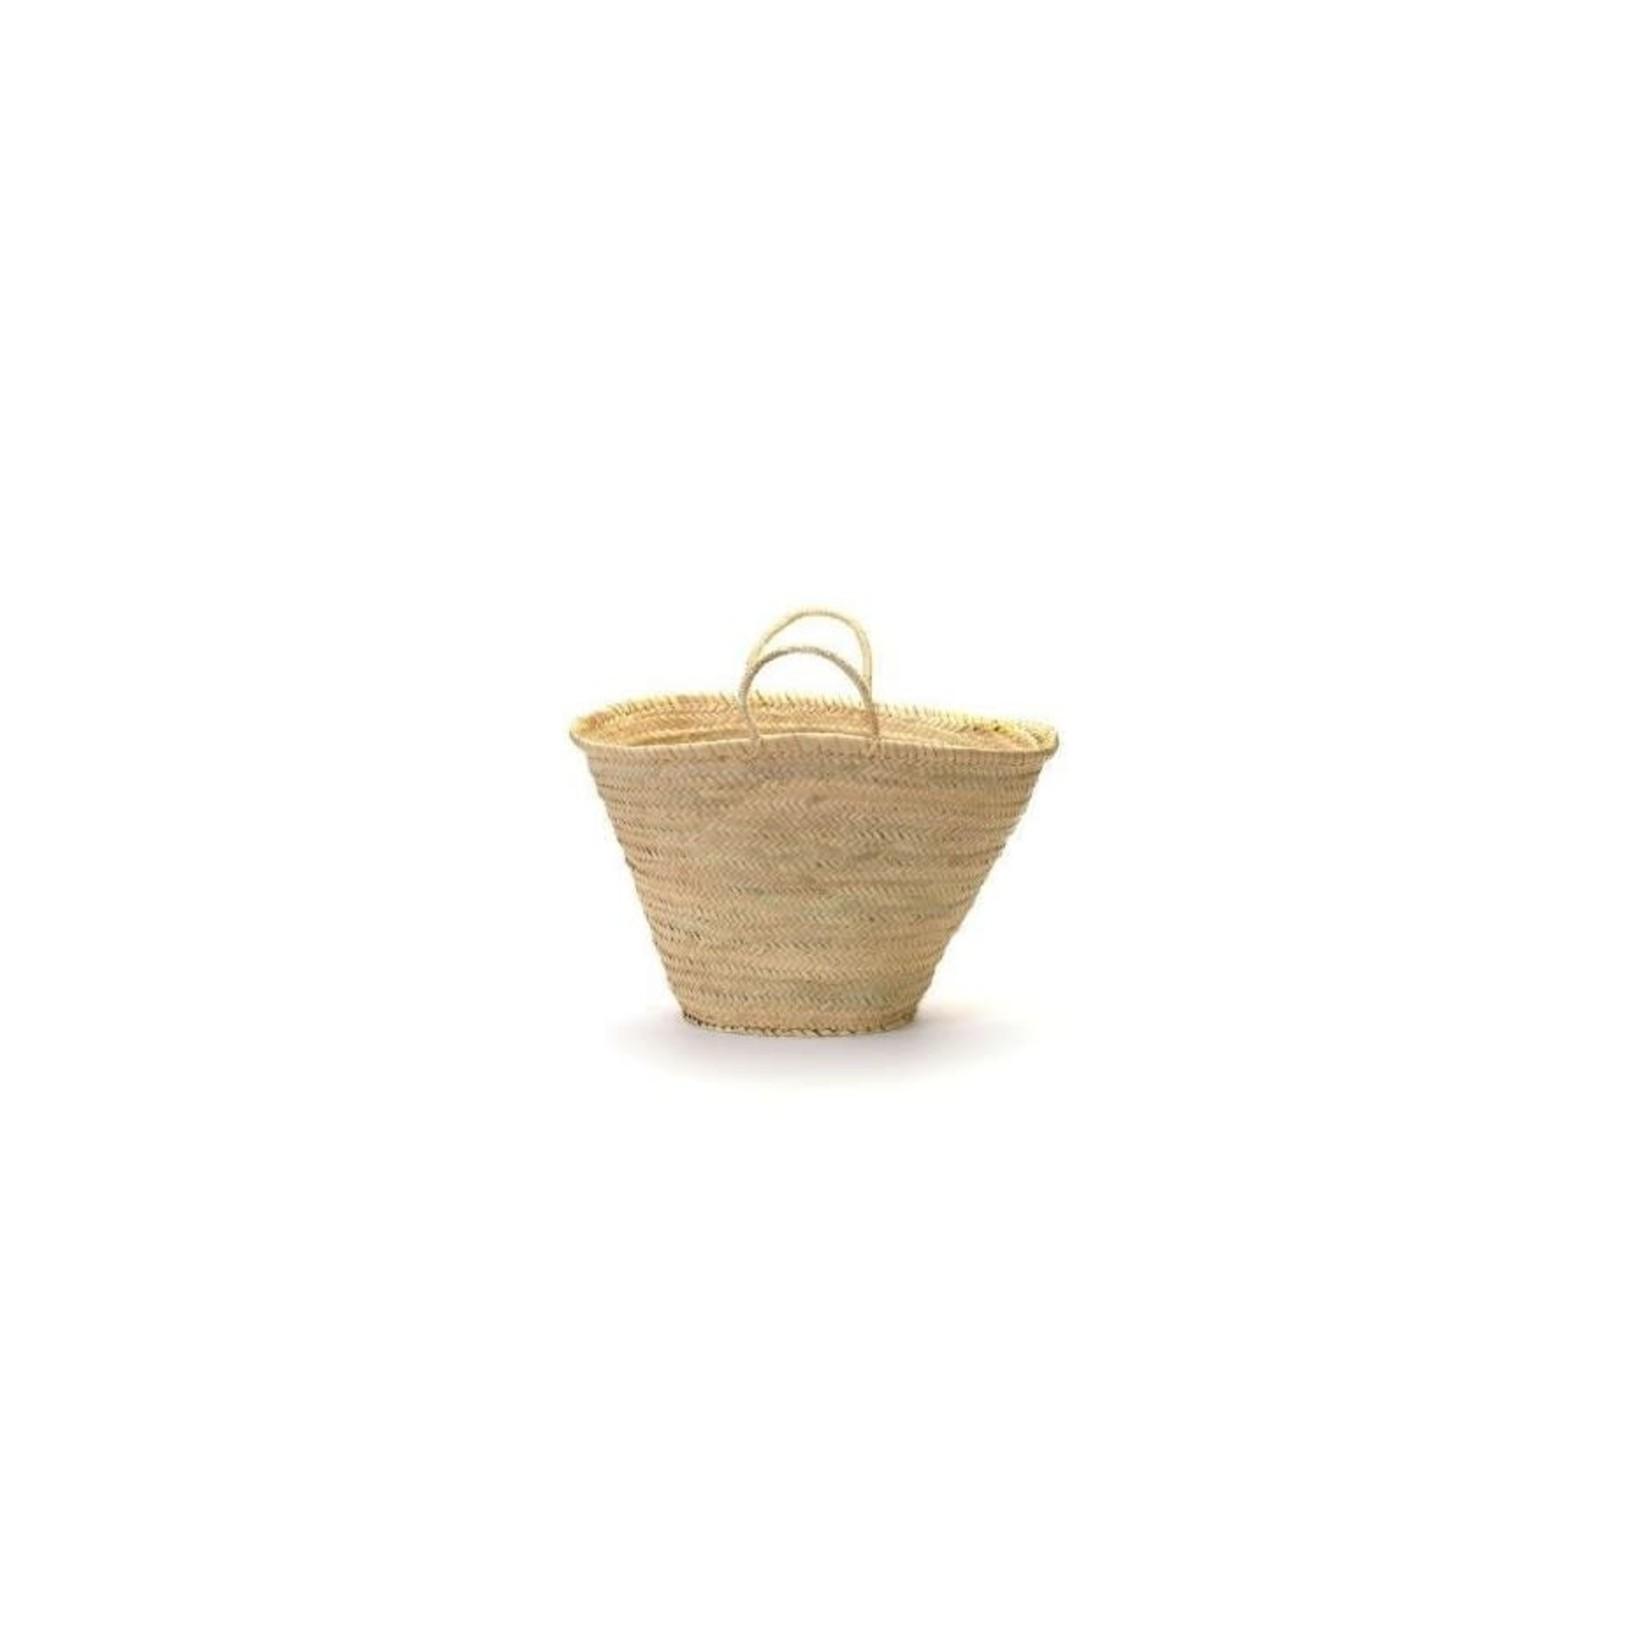 Provence Market Bag with Sisal Handles